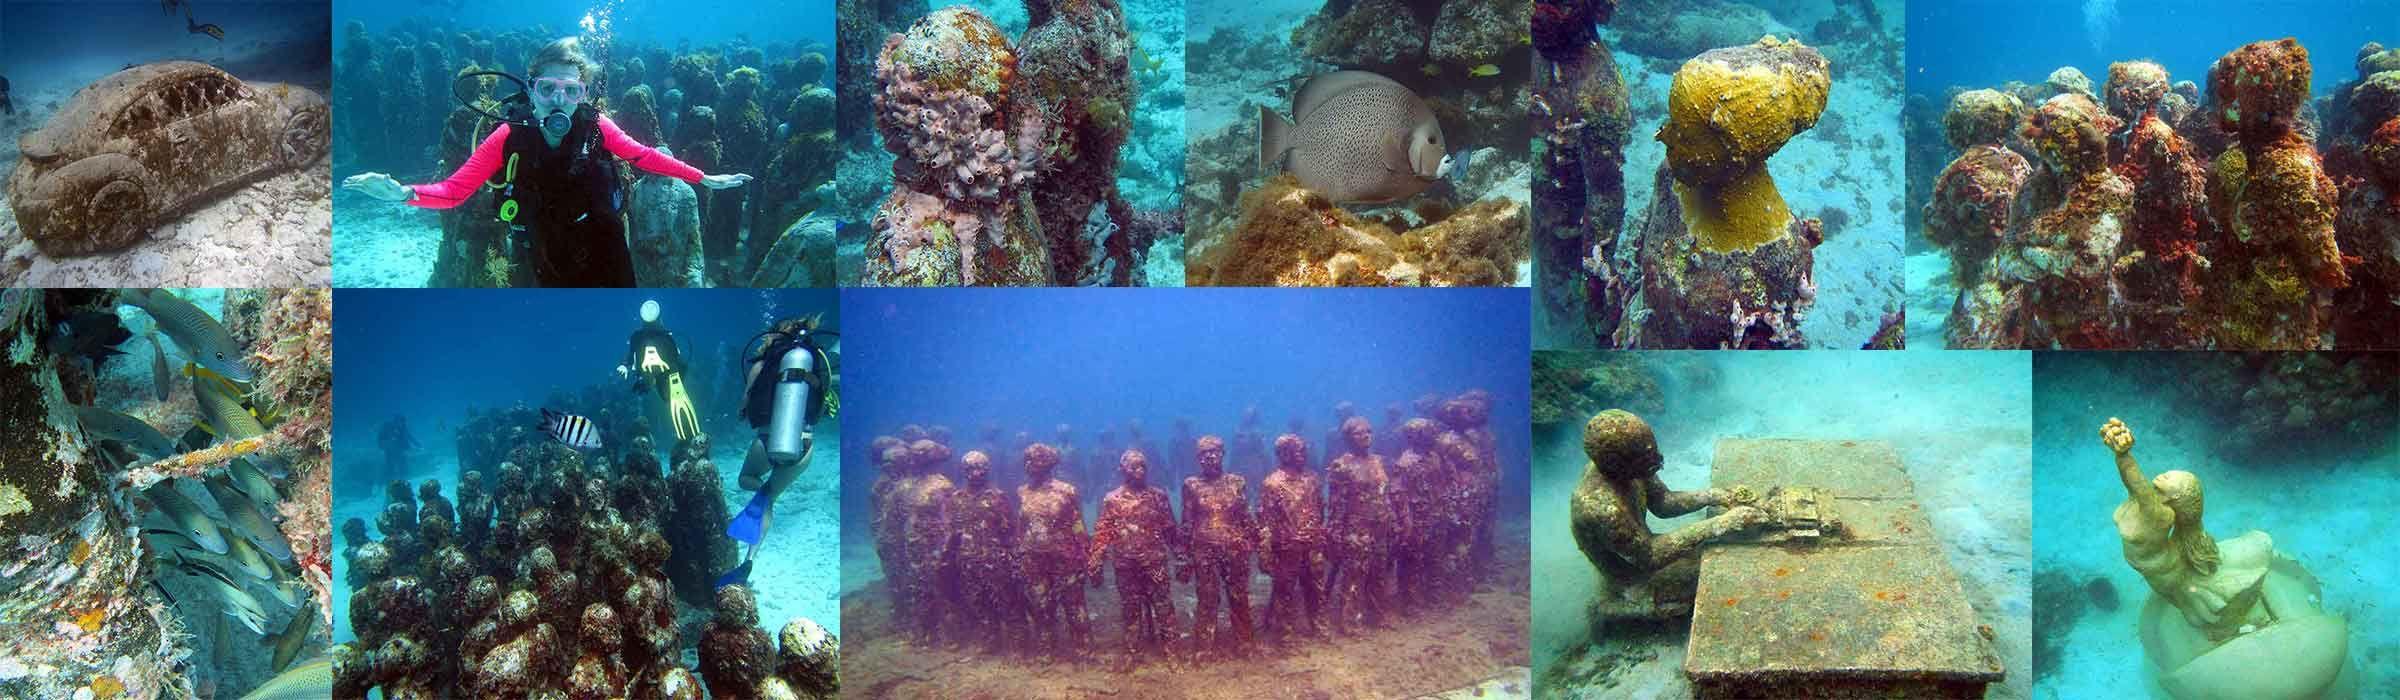 Undersea Attractions: Underwater Sculpture Parks in Grenada and Mexico